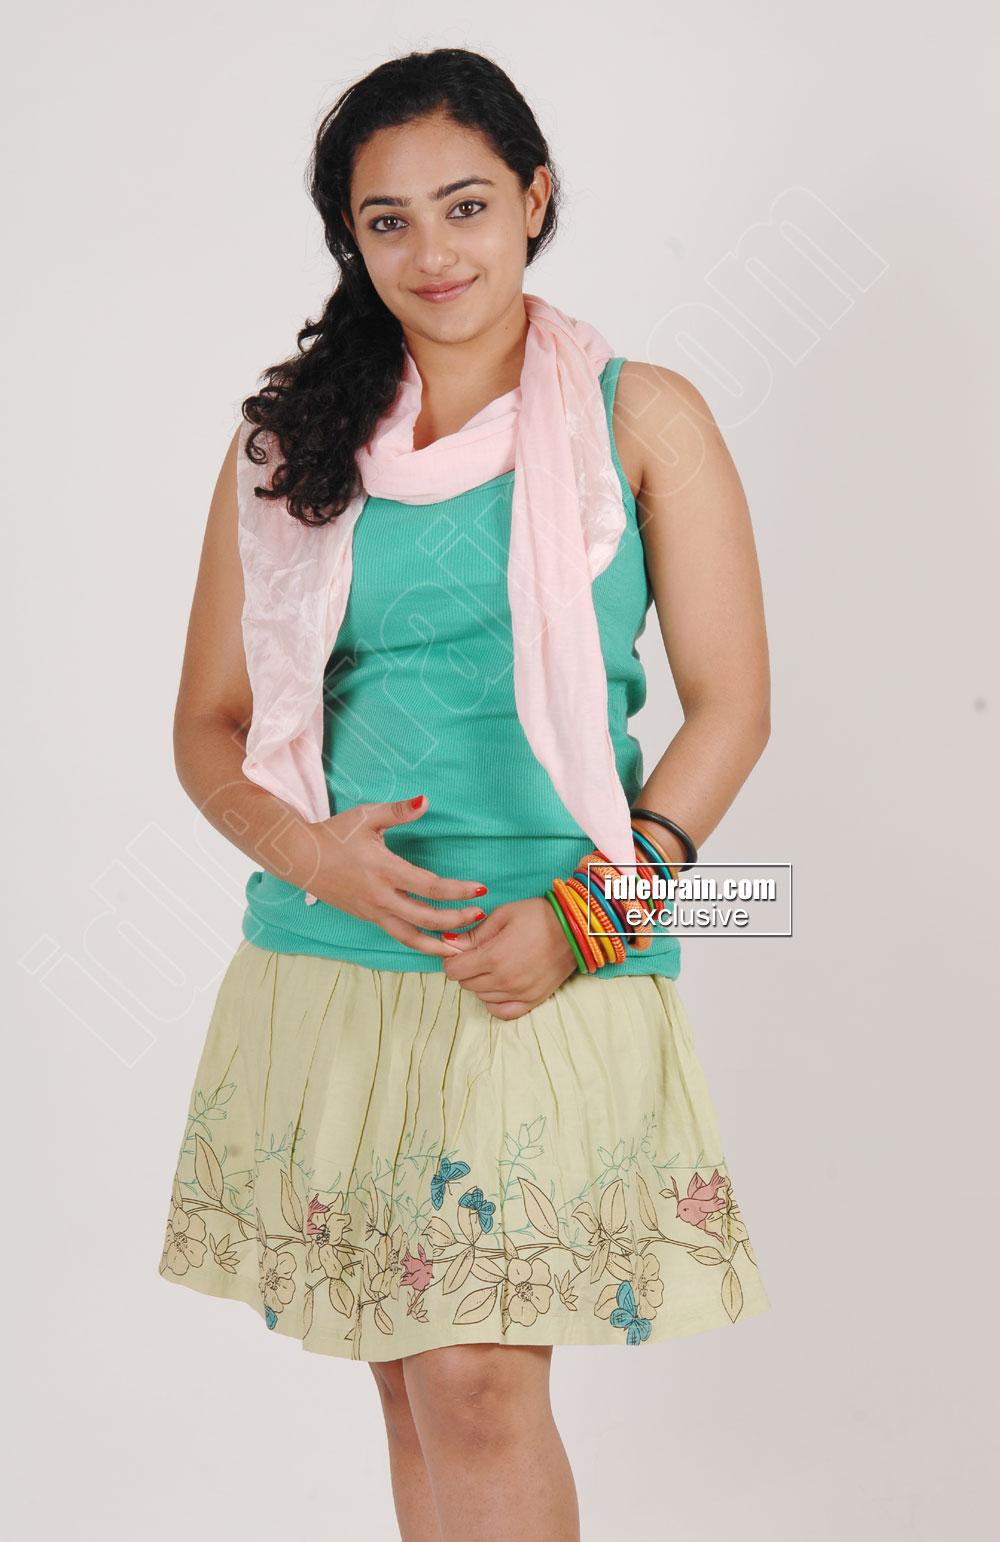 South Indian actress Nithya Menon latest hot photos.